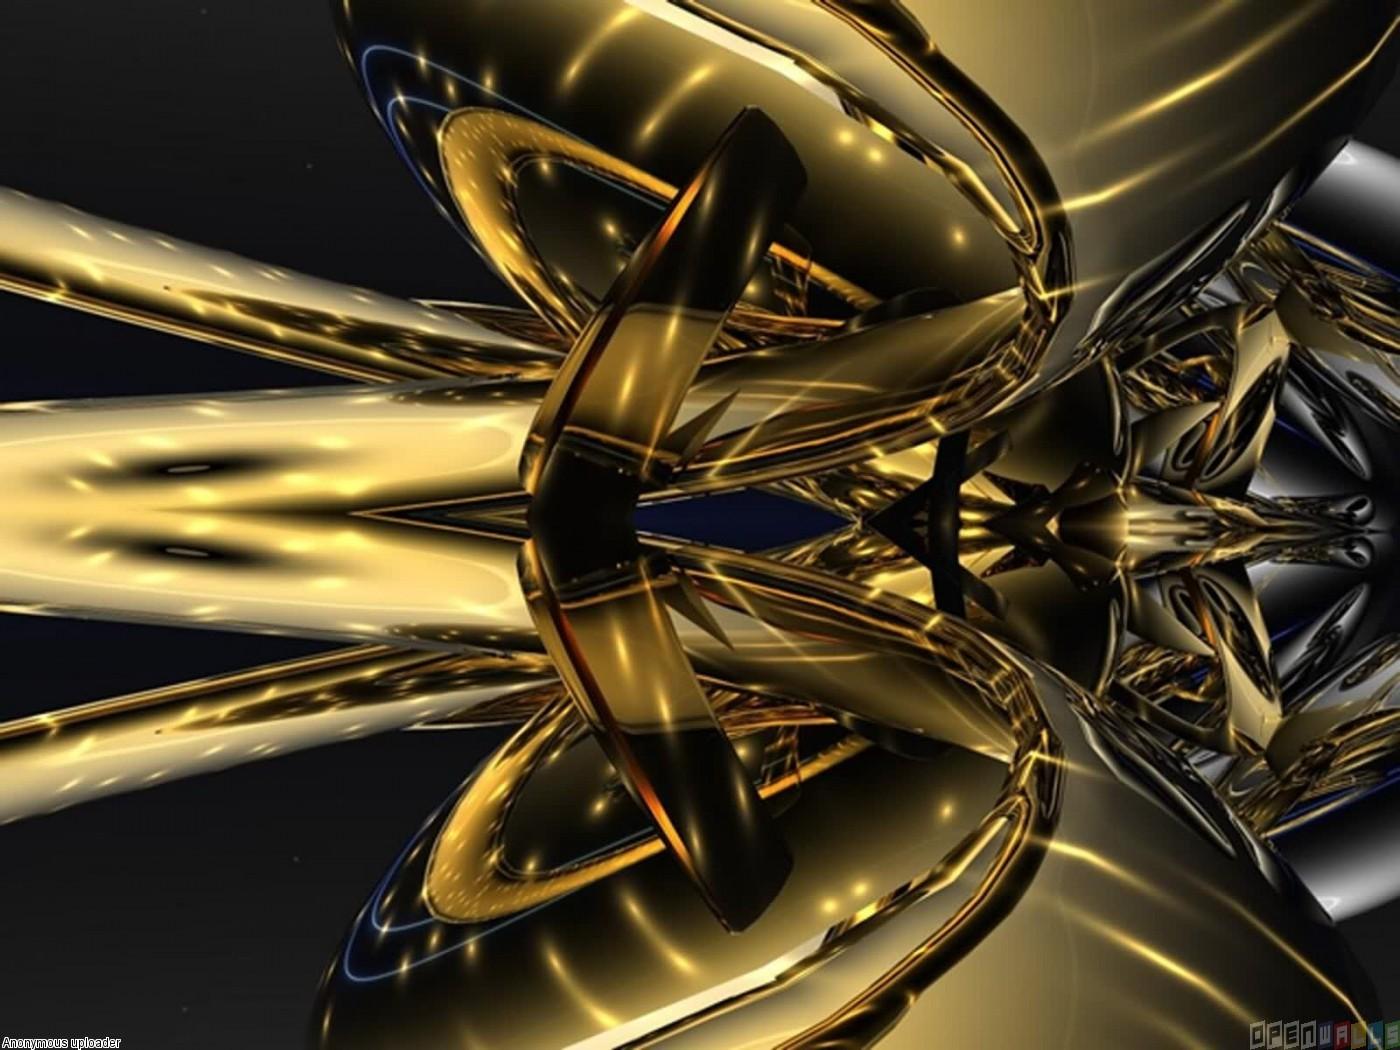 Abstract gold wallpaper 4107   Open Walls 1400x1050